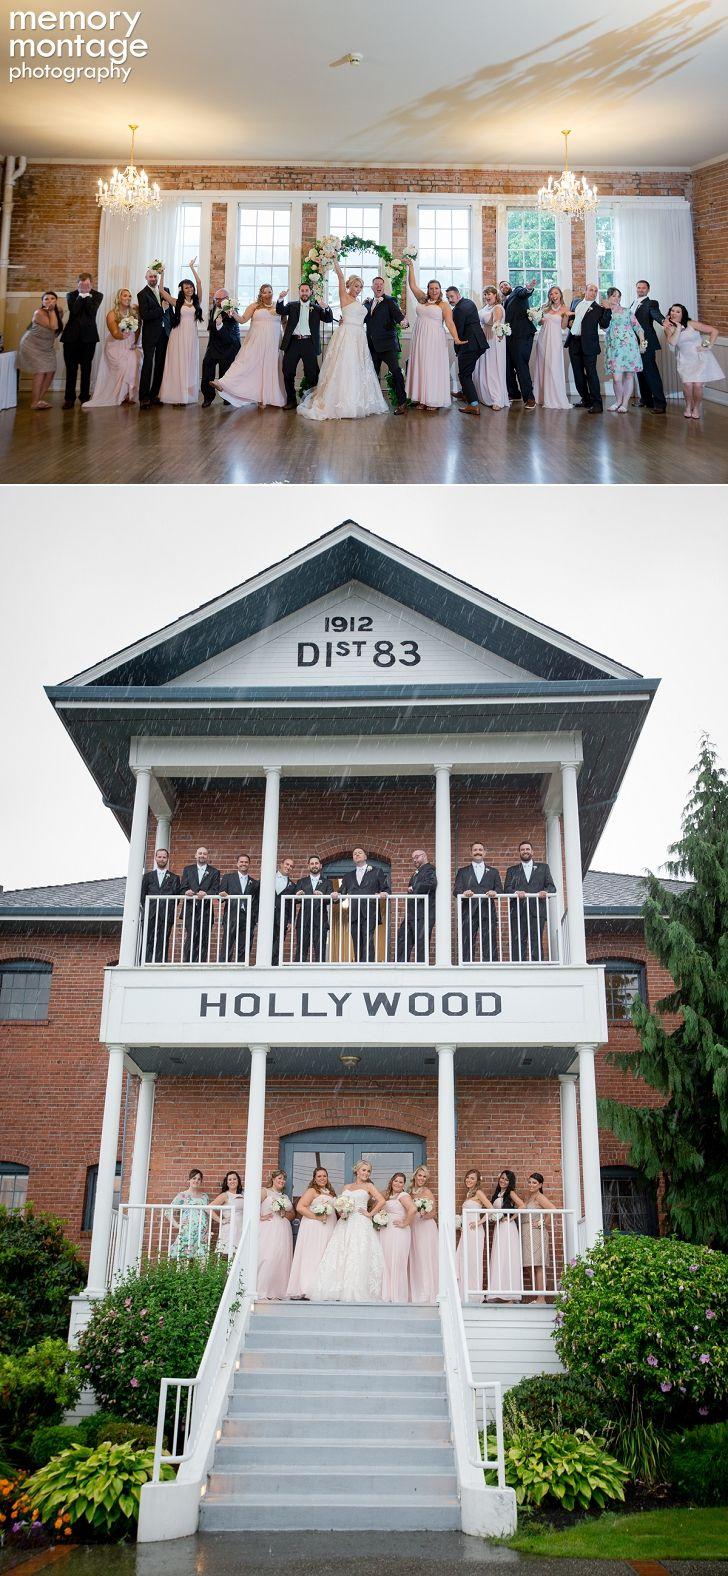 Hollywood Schoolhouse Wedding, Woodinville, WA, Seattle Wedding Photography, www.memorymp.com, #memorymontagephotography, bride and groom, blush wedding, bridal party, Memory Montage Photography